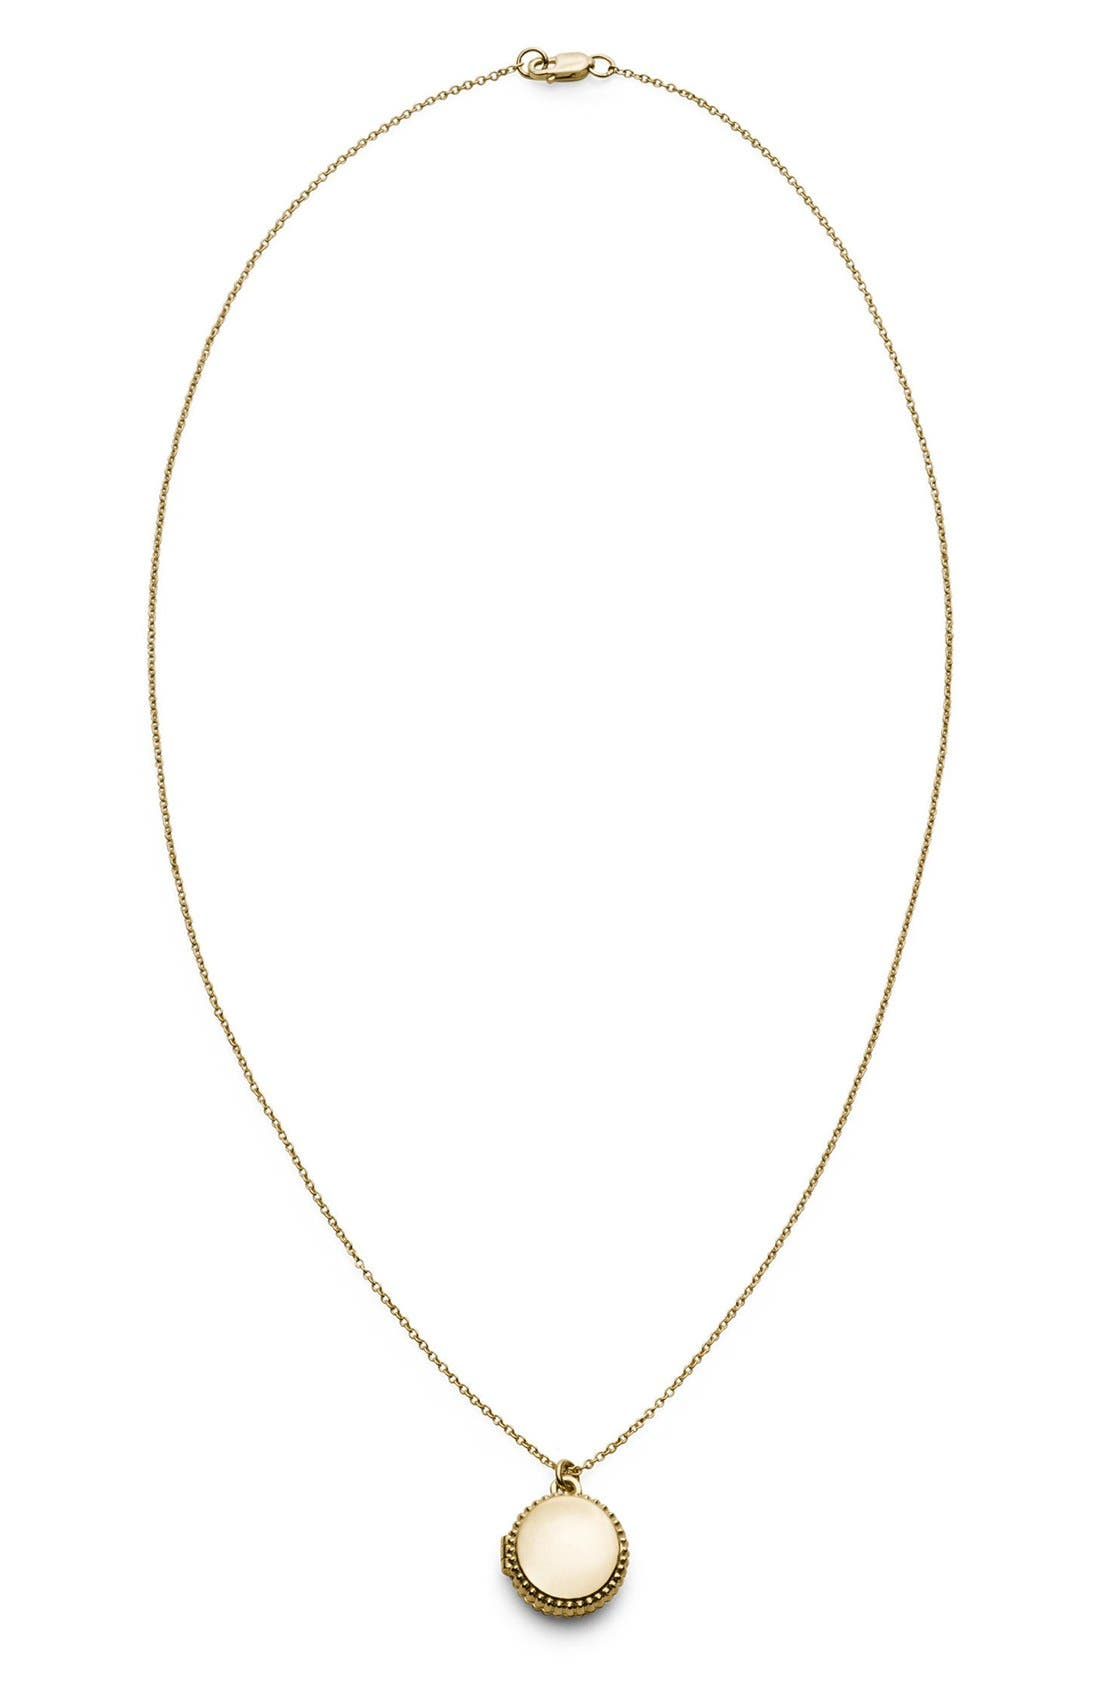 Alternate Image 1 Selected - Shinola Coin Edge Locket Necklace